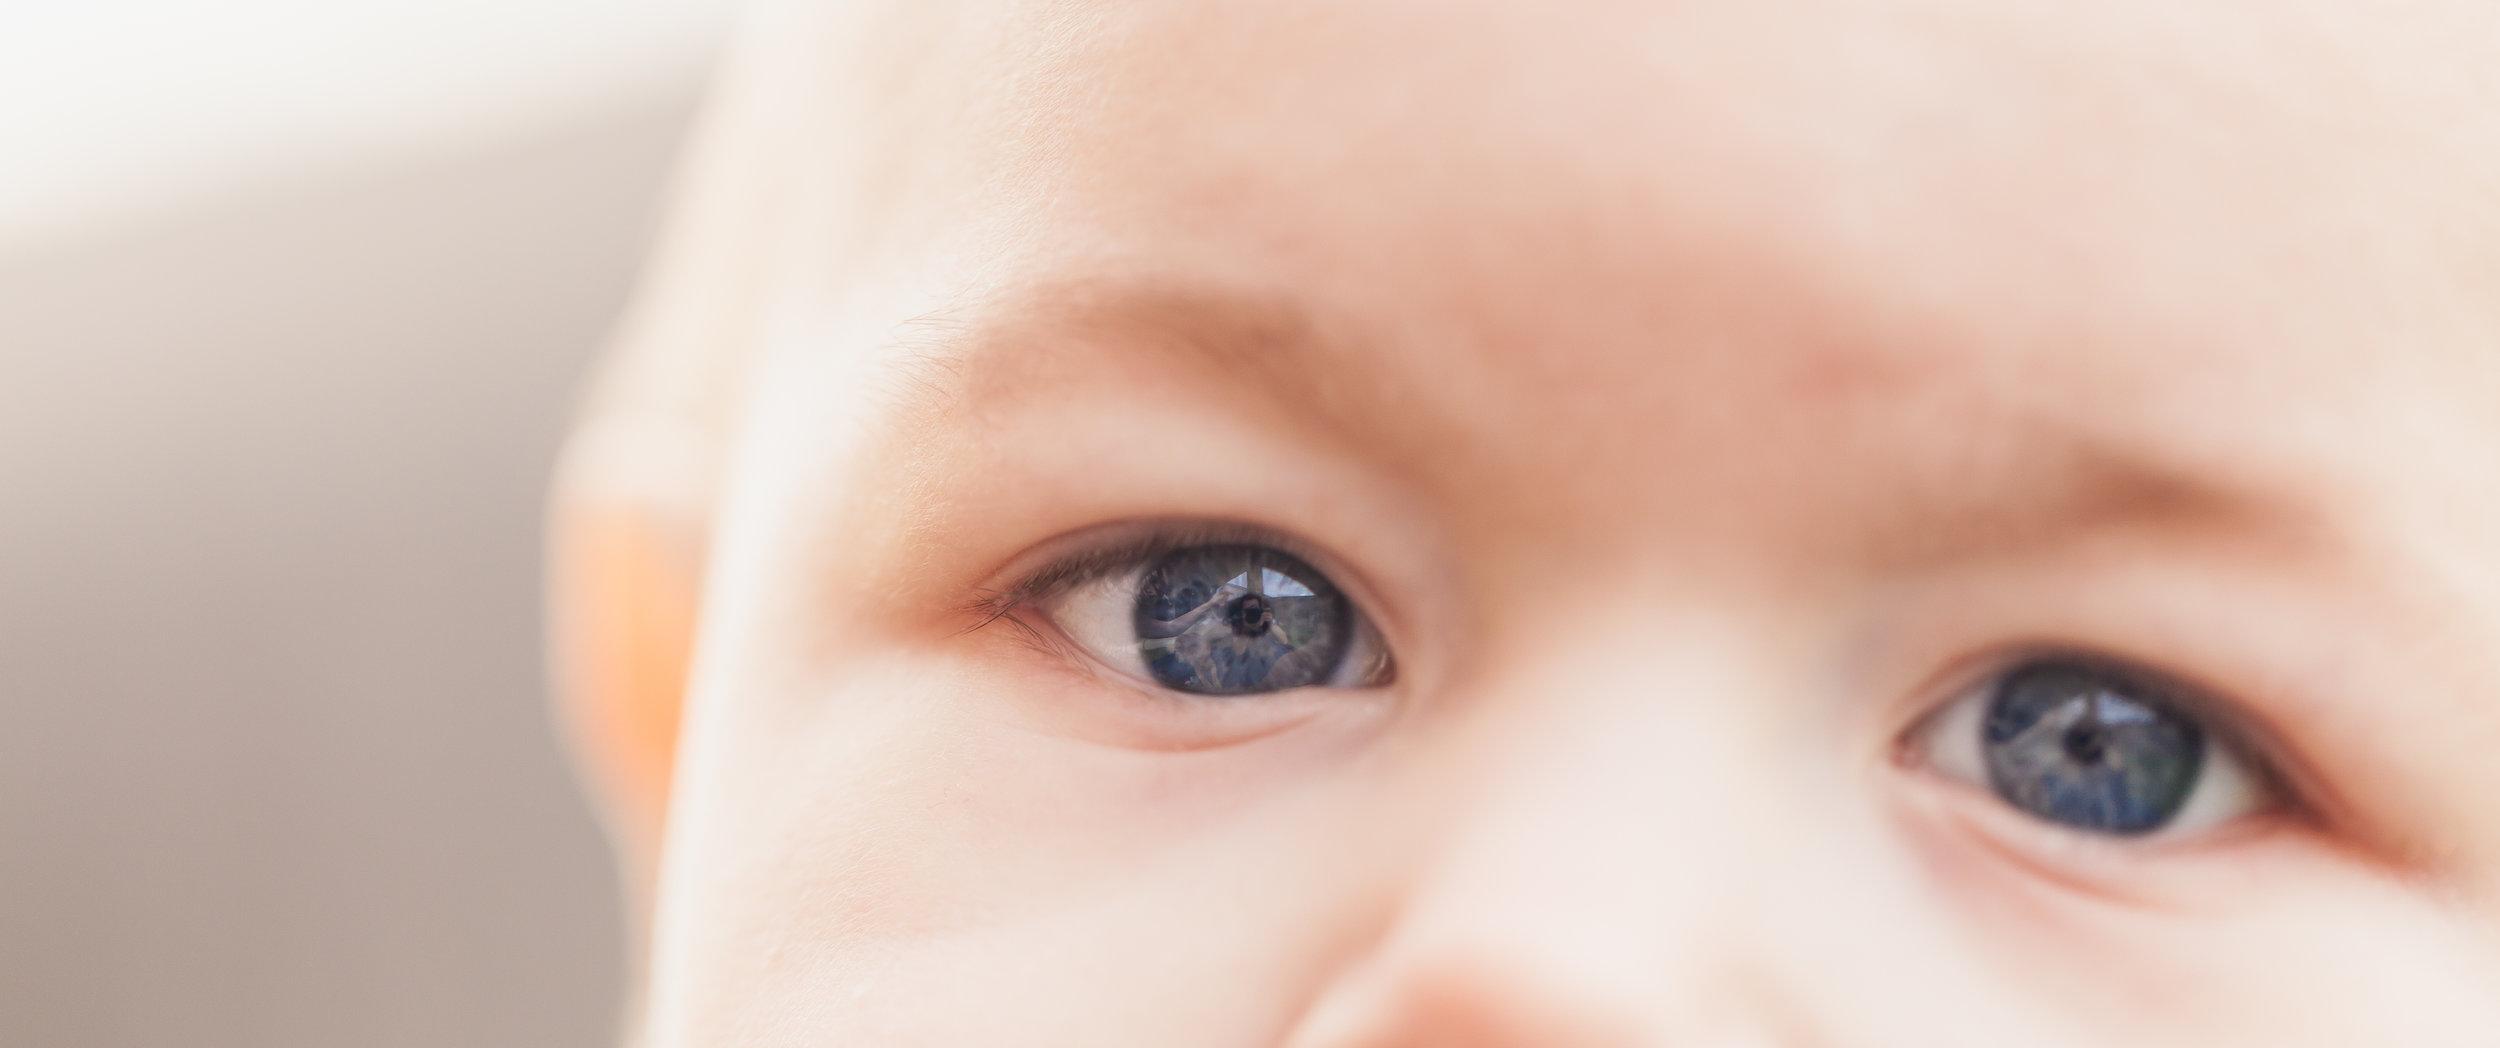 Pediatric - Opthalmology